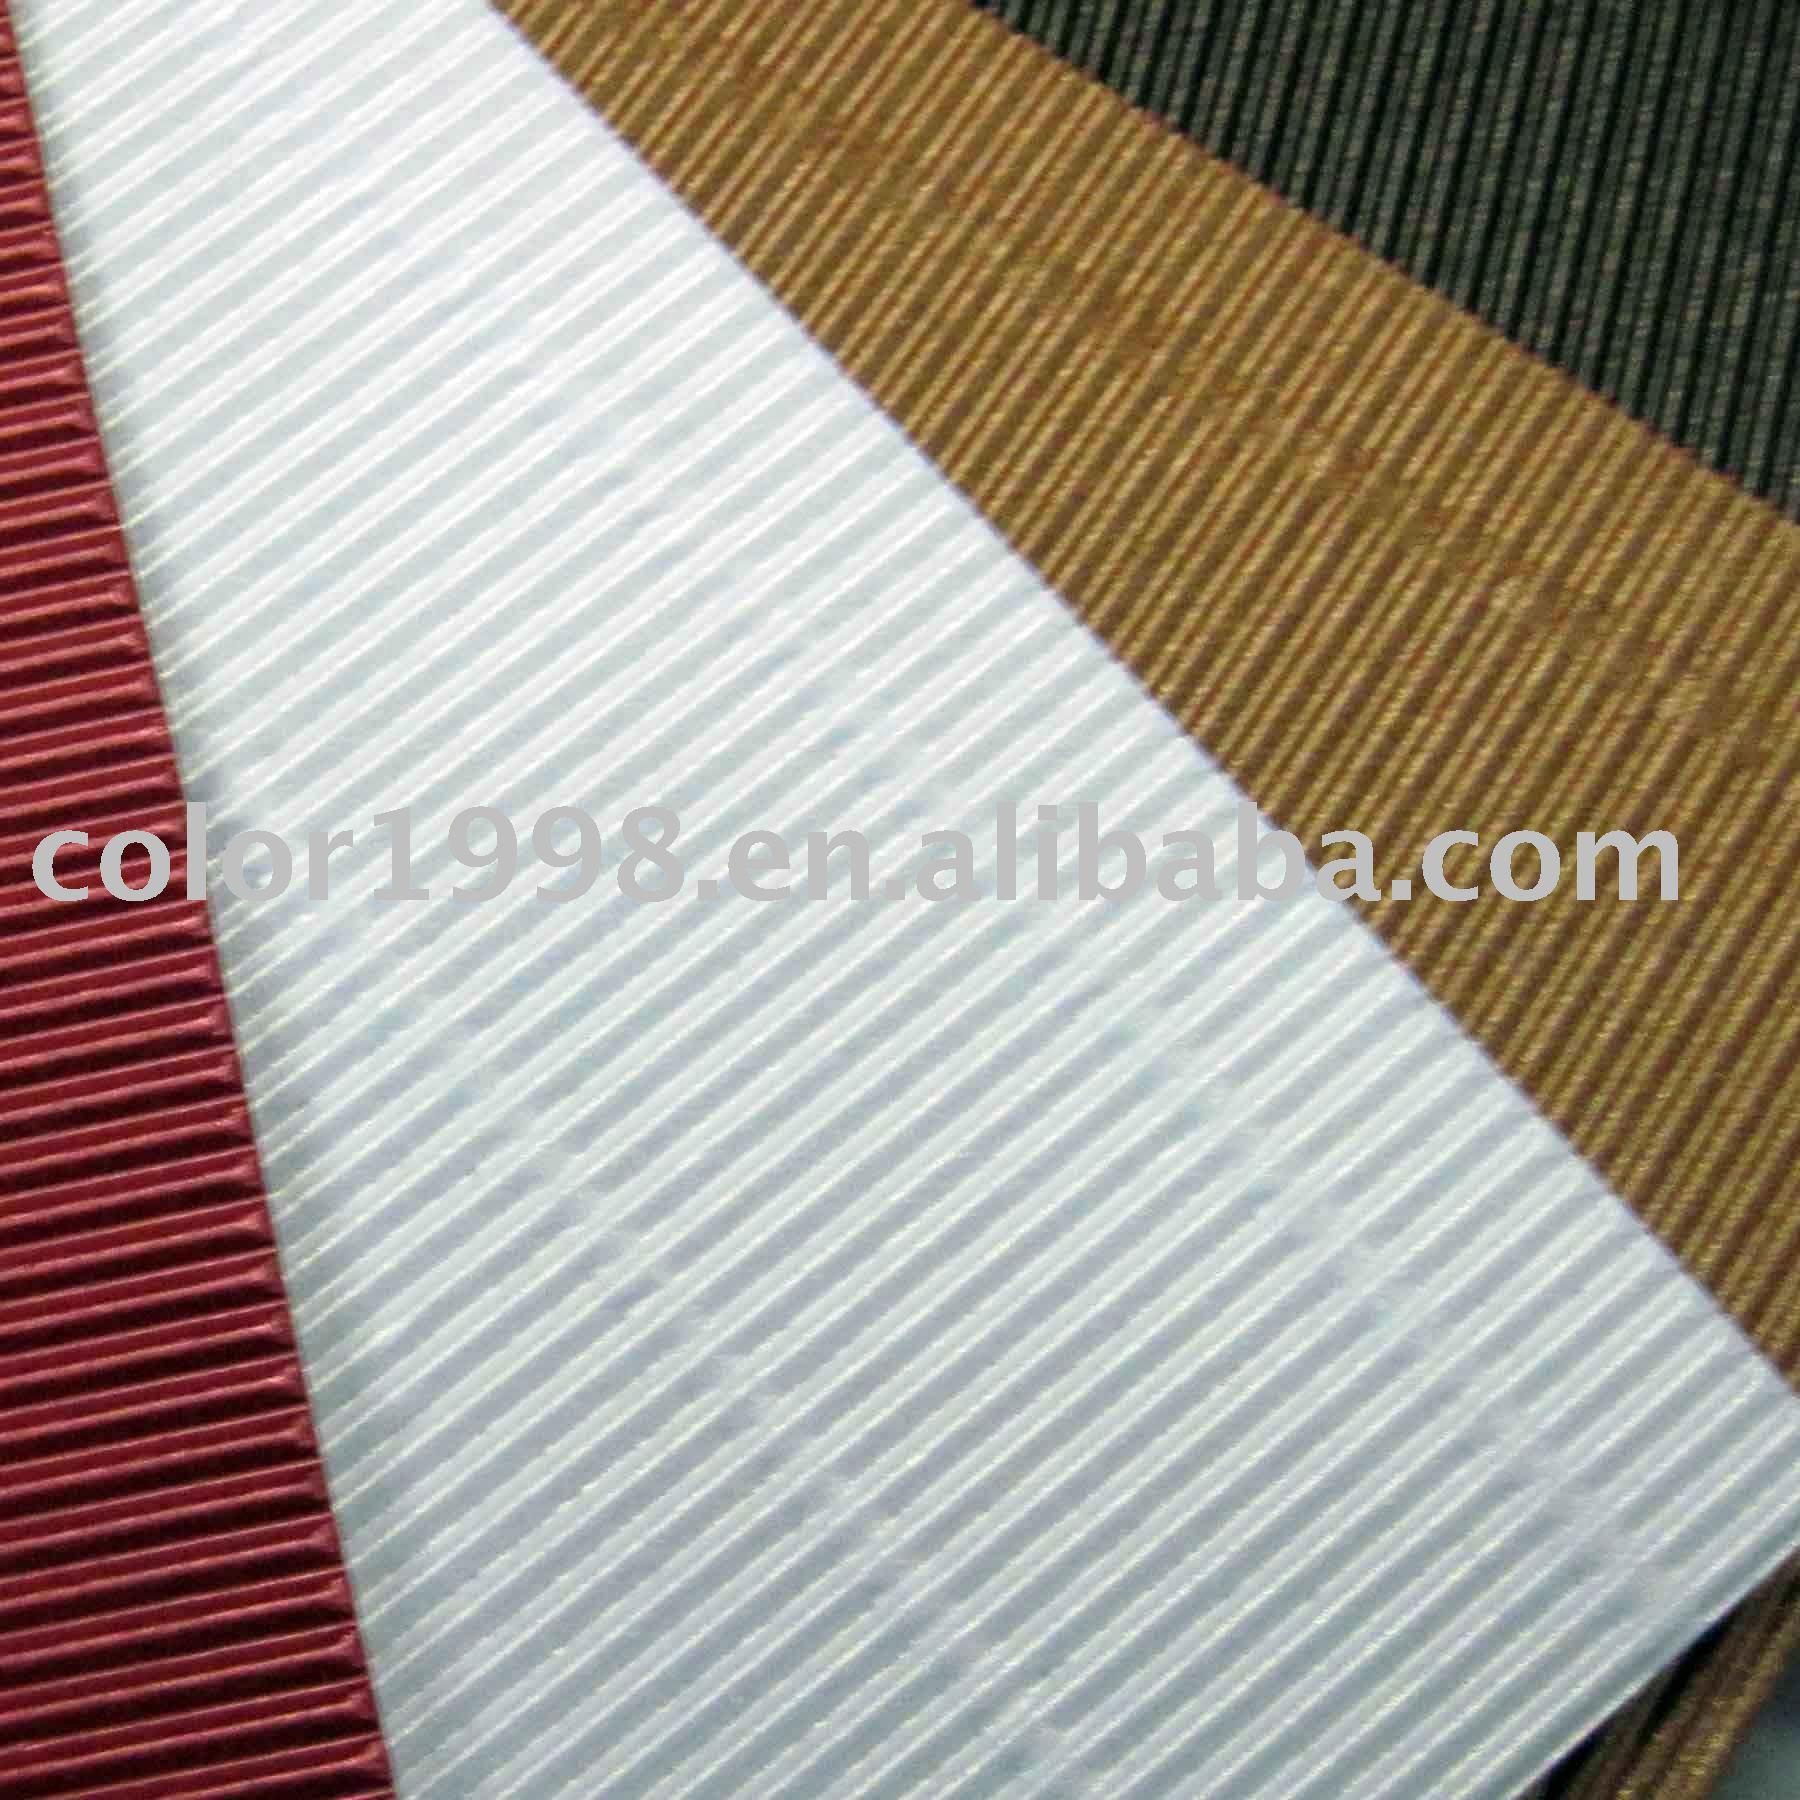 bristol board/color corrugated paper sheet/corrugated cardboard on ...